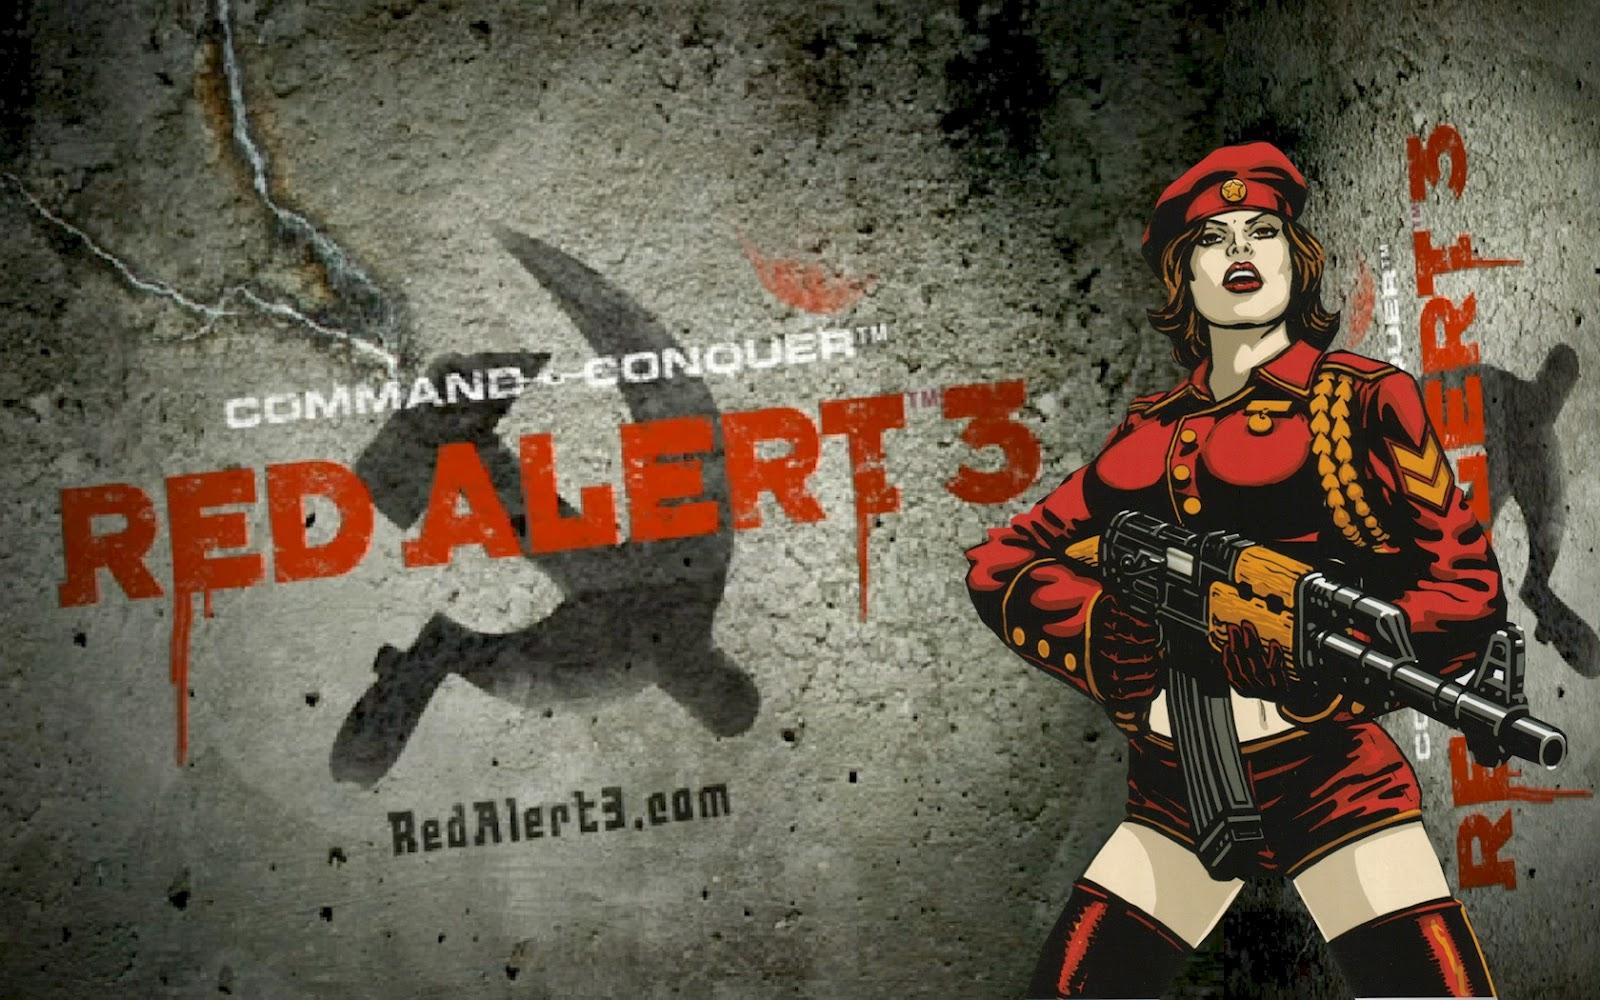 http://3.bp.blogspot.com/-WTaKlgPX8pQ/T0UpJpz2M3I/AAAAAAAAAs8/muiOAx0p9QY/s1600/Red_Alert_3_Armed_Girl_AK47_HD_Wallpaper-gWb.jpg